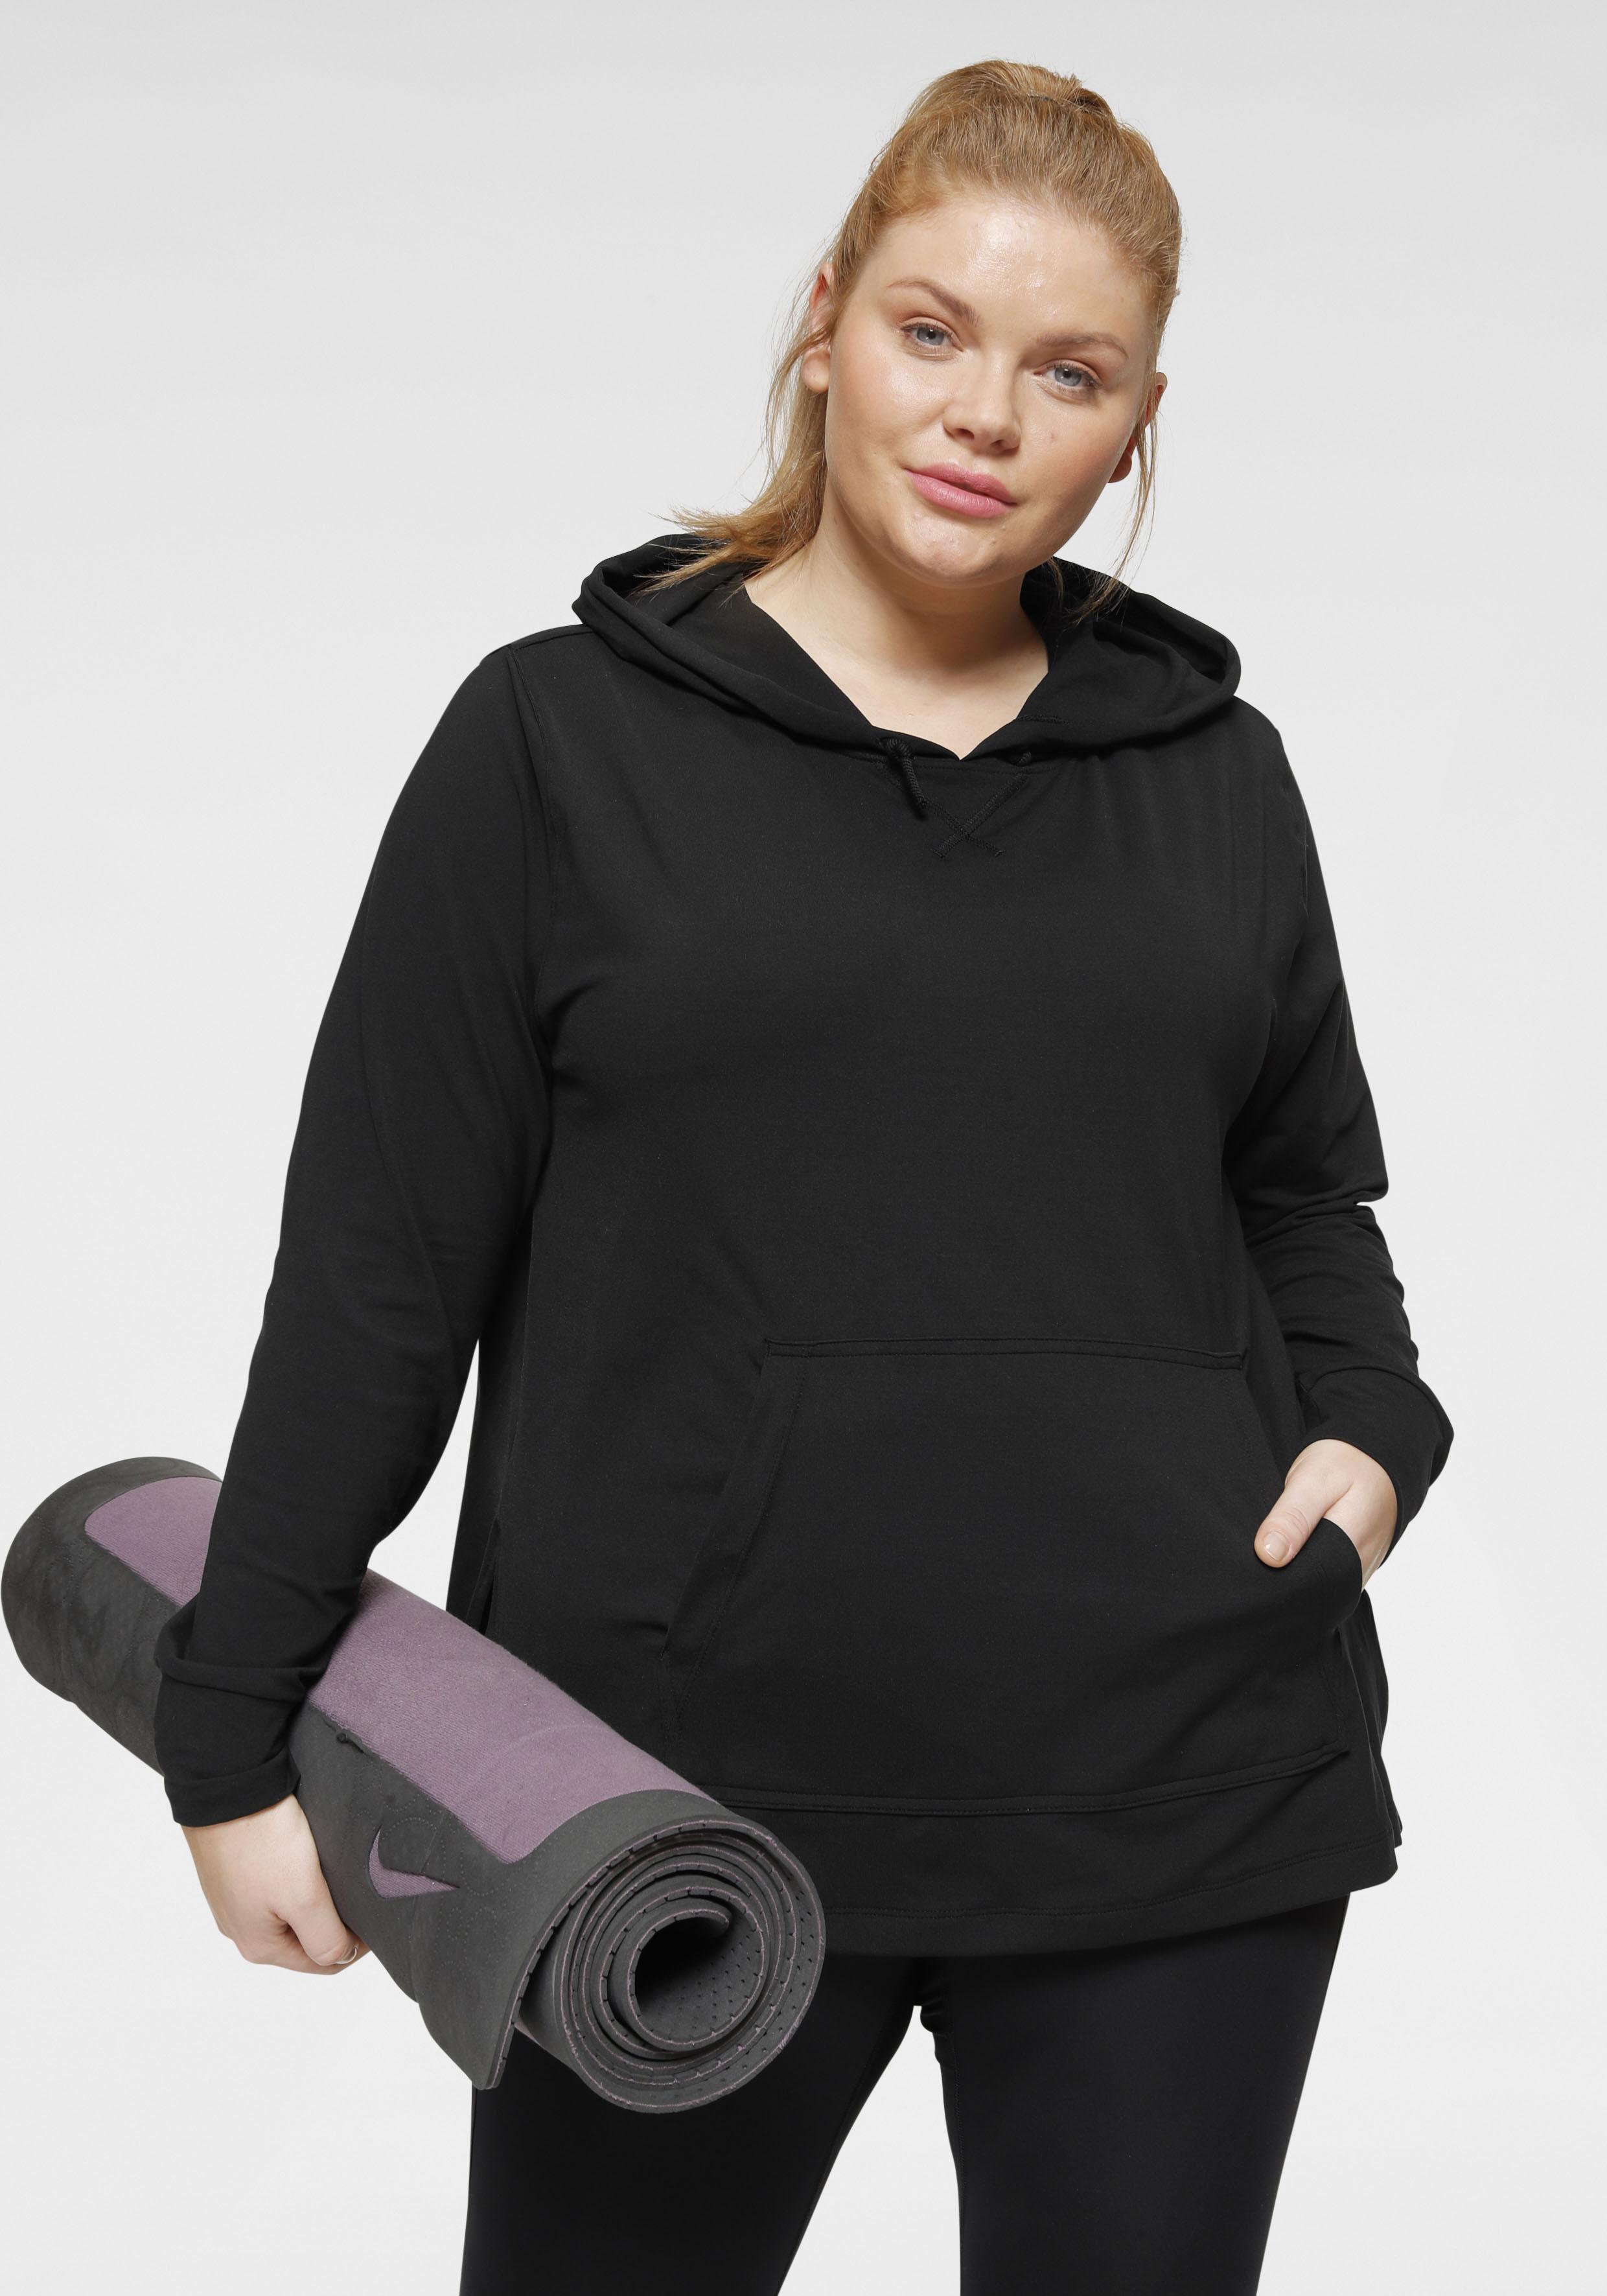 nike -  Yogashirt Women's Yoga Training Hoodie (Plus Size)